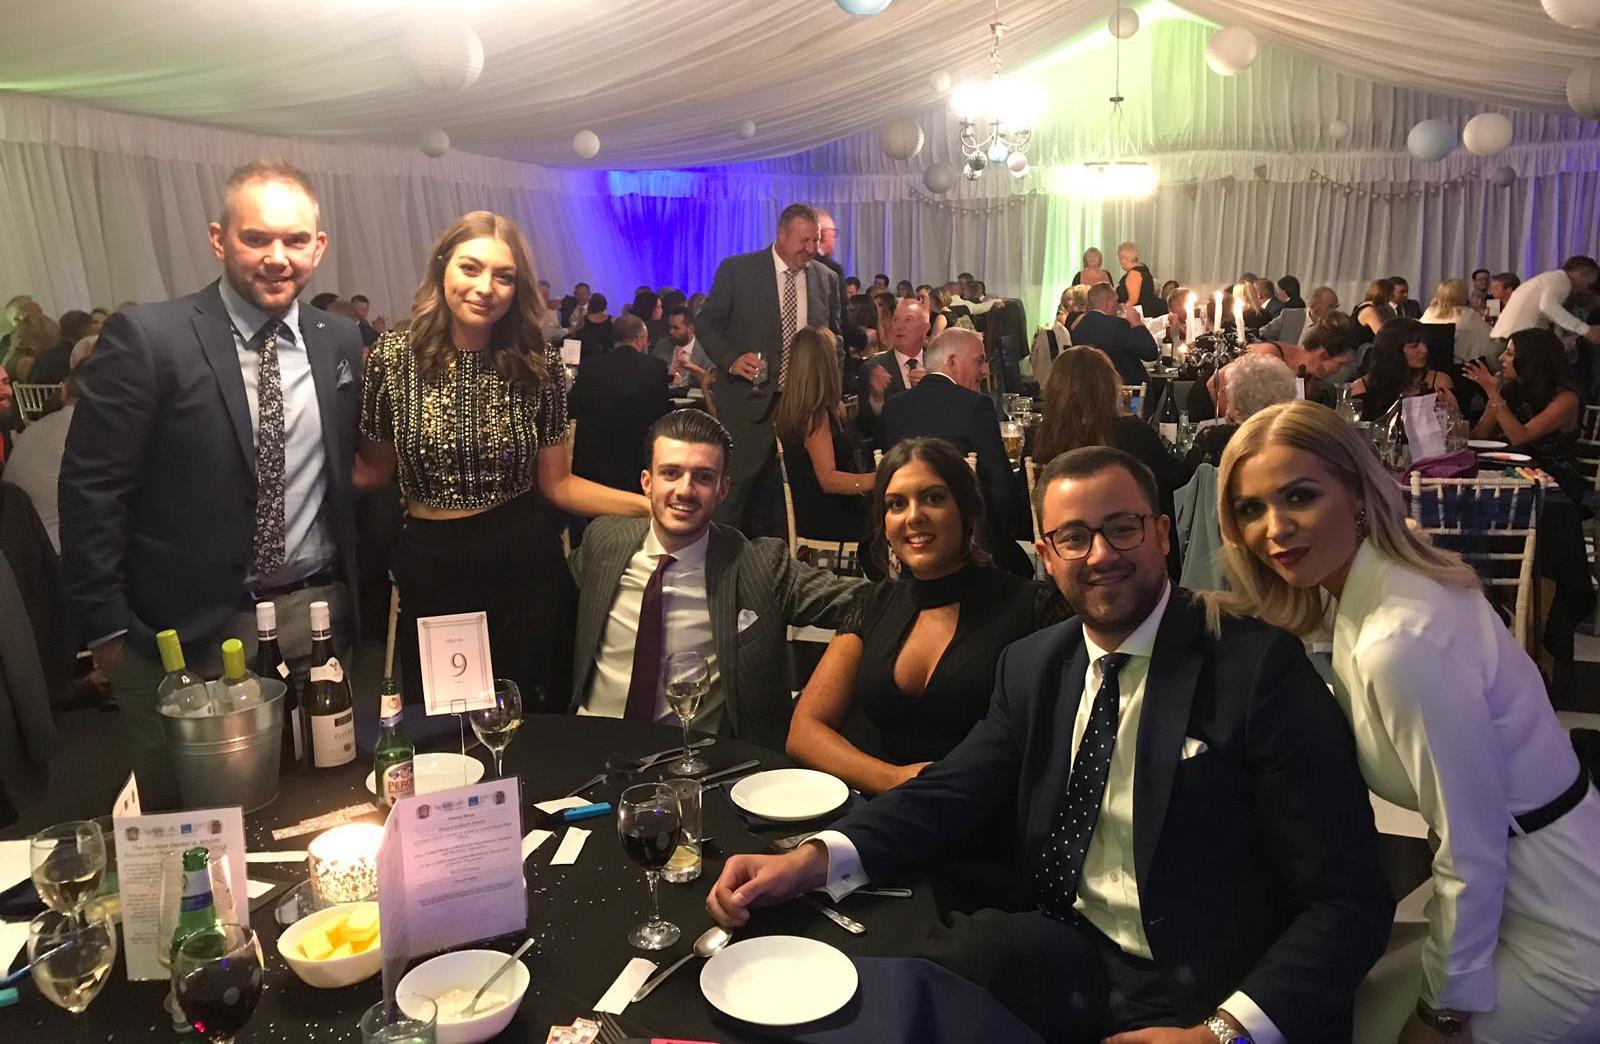 M&DH Insurance   13th Annual Charity Golf Day at Pavenham ...